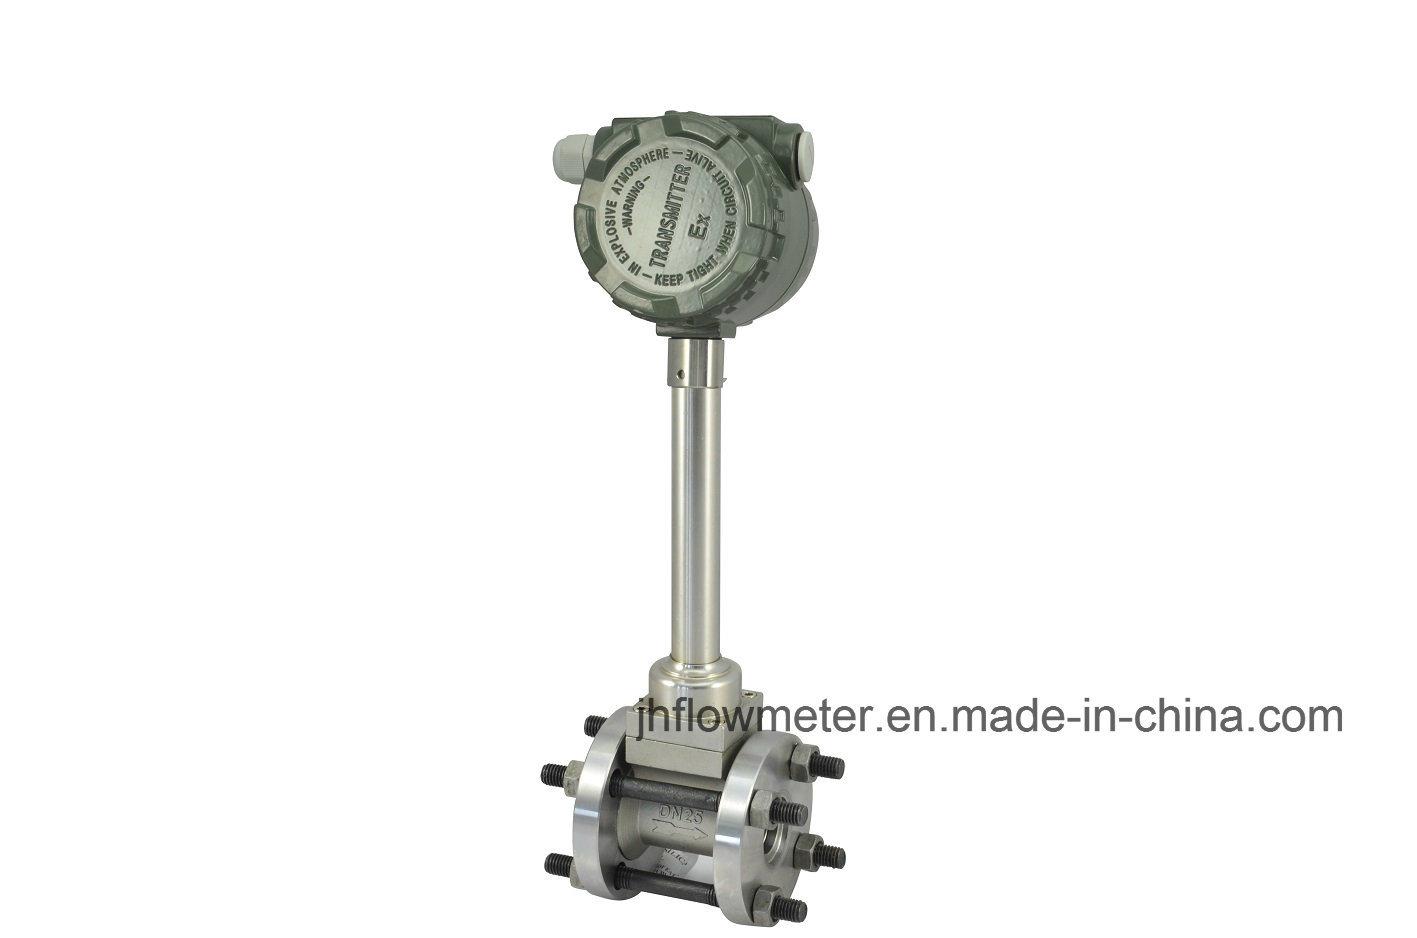 High Temperature Gas Steam Liquid Flowmeter with Flange Connect